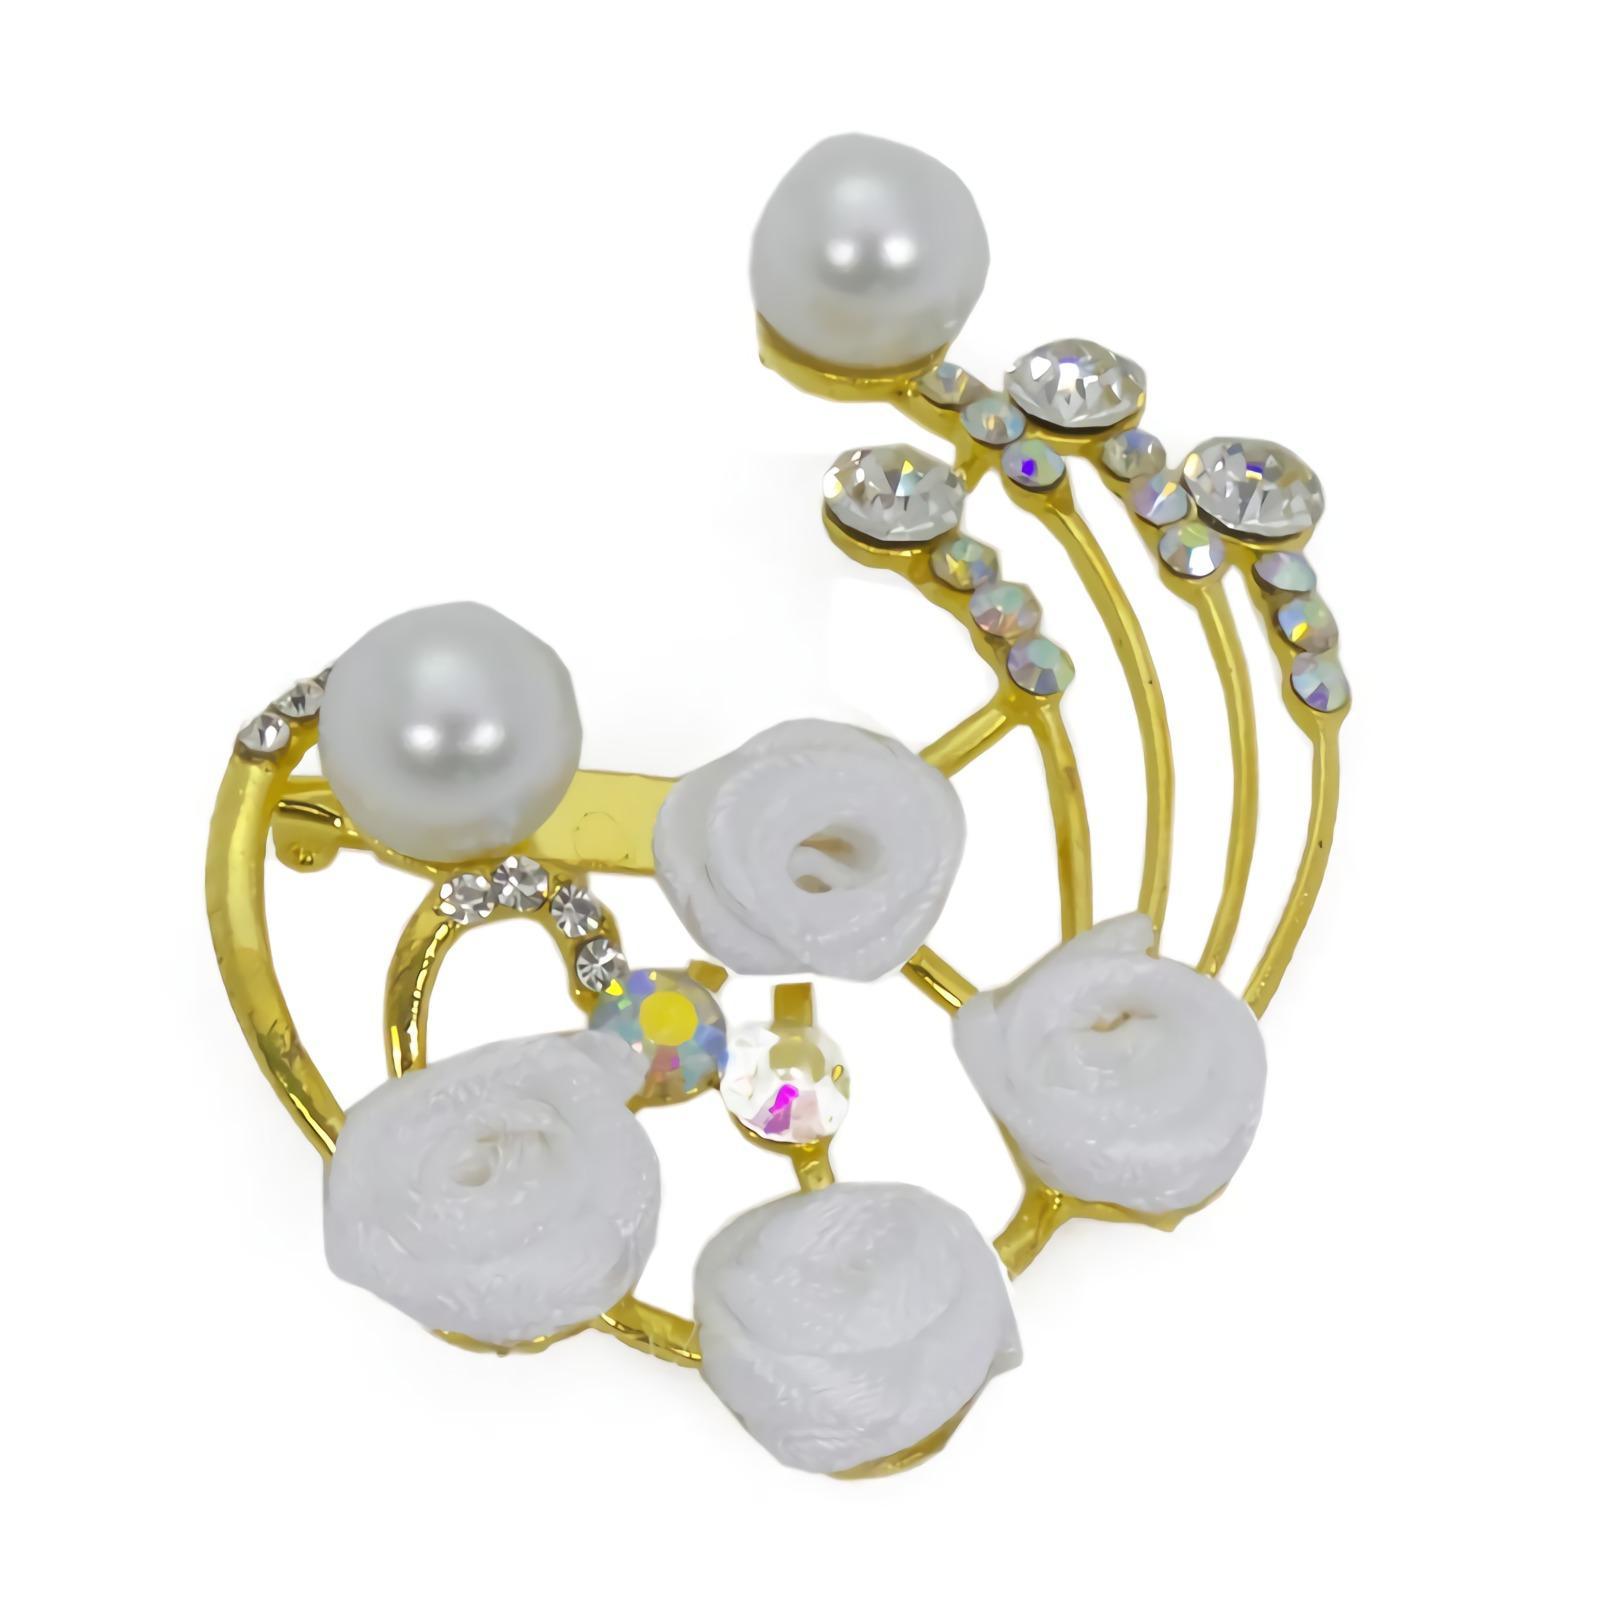 OFASHION Aksesoris Bros [1 Pcs] CA-618-C Hijab Jilbab Mawar Kecil Fashion Jewelry Xuping Emas Putih